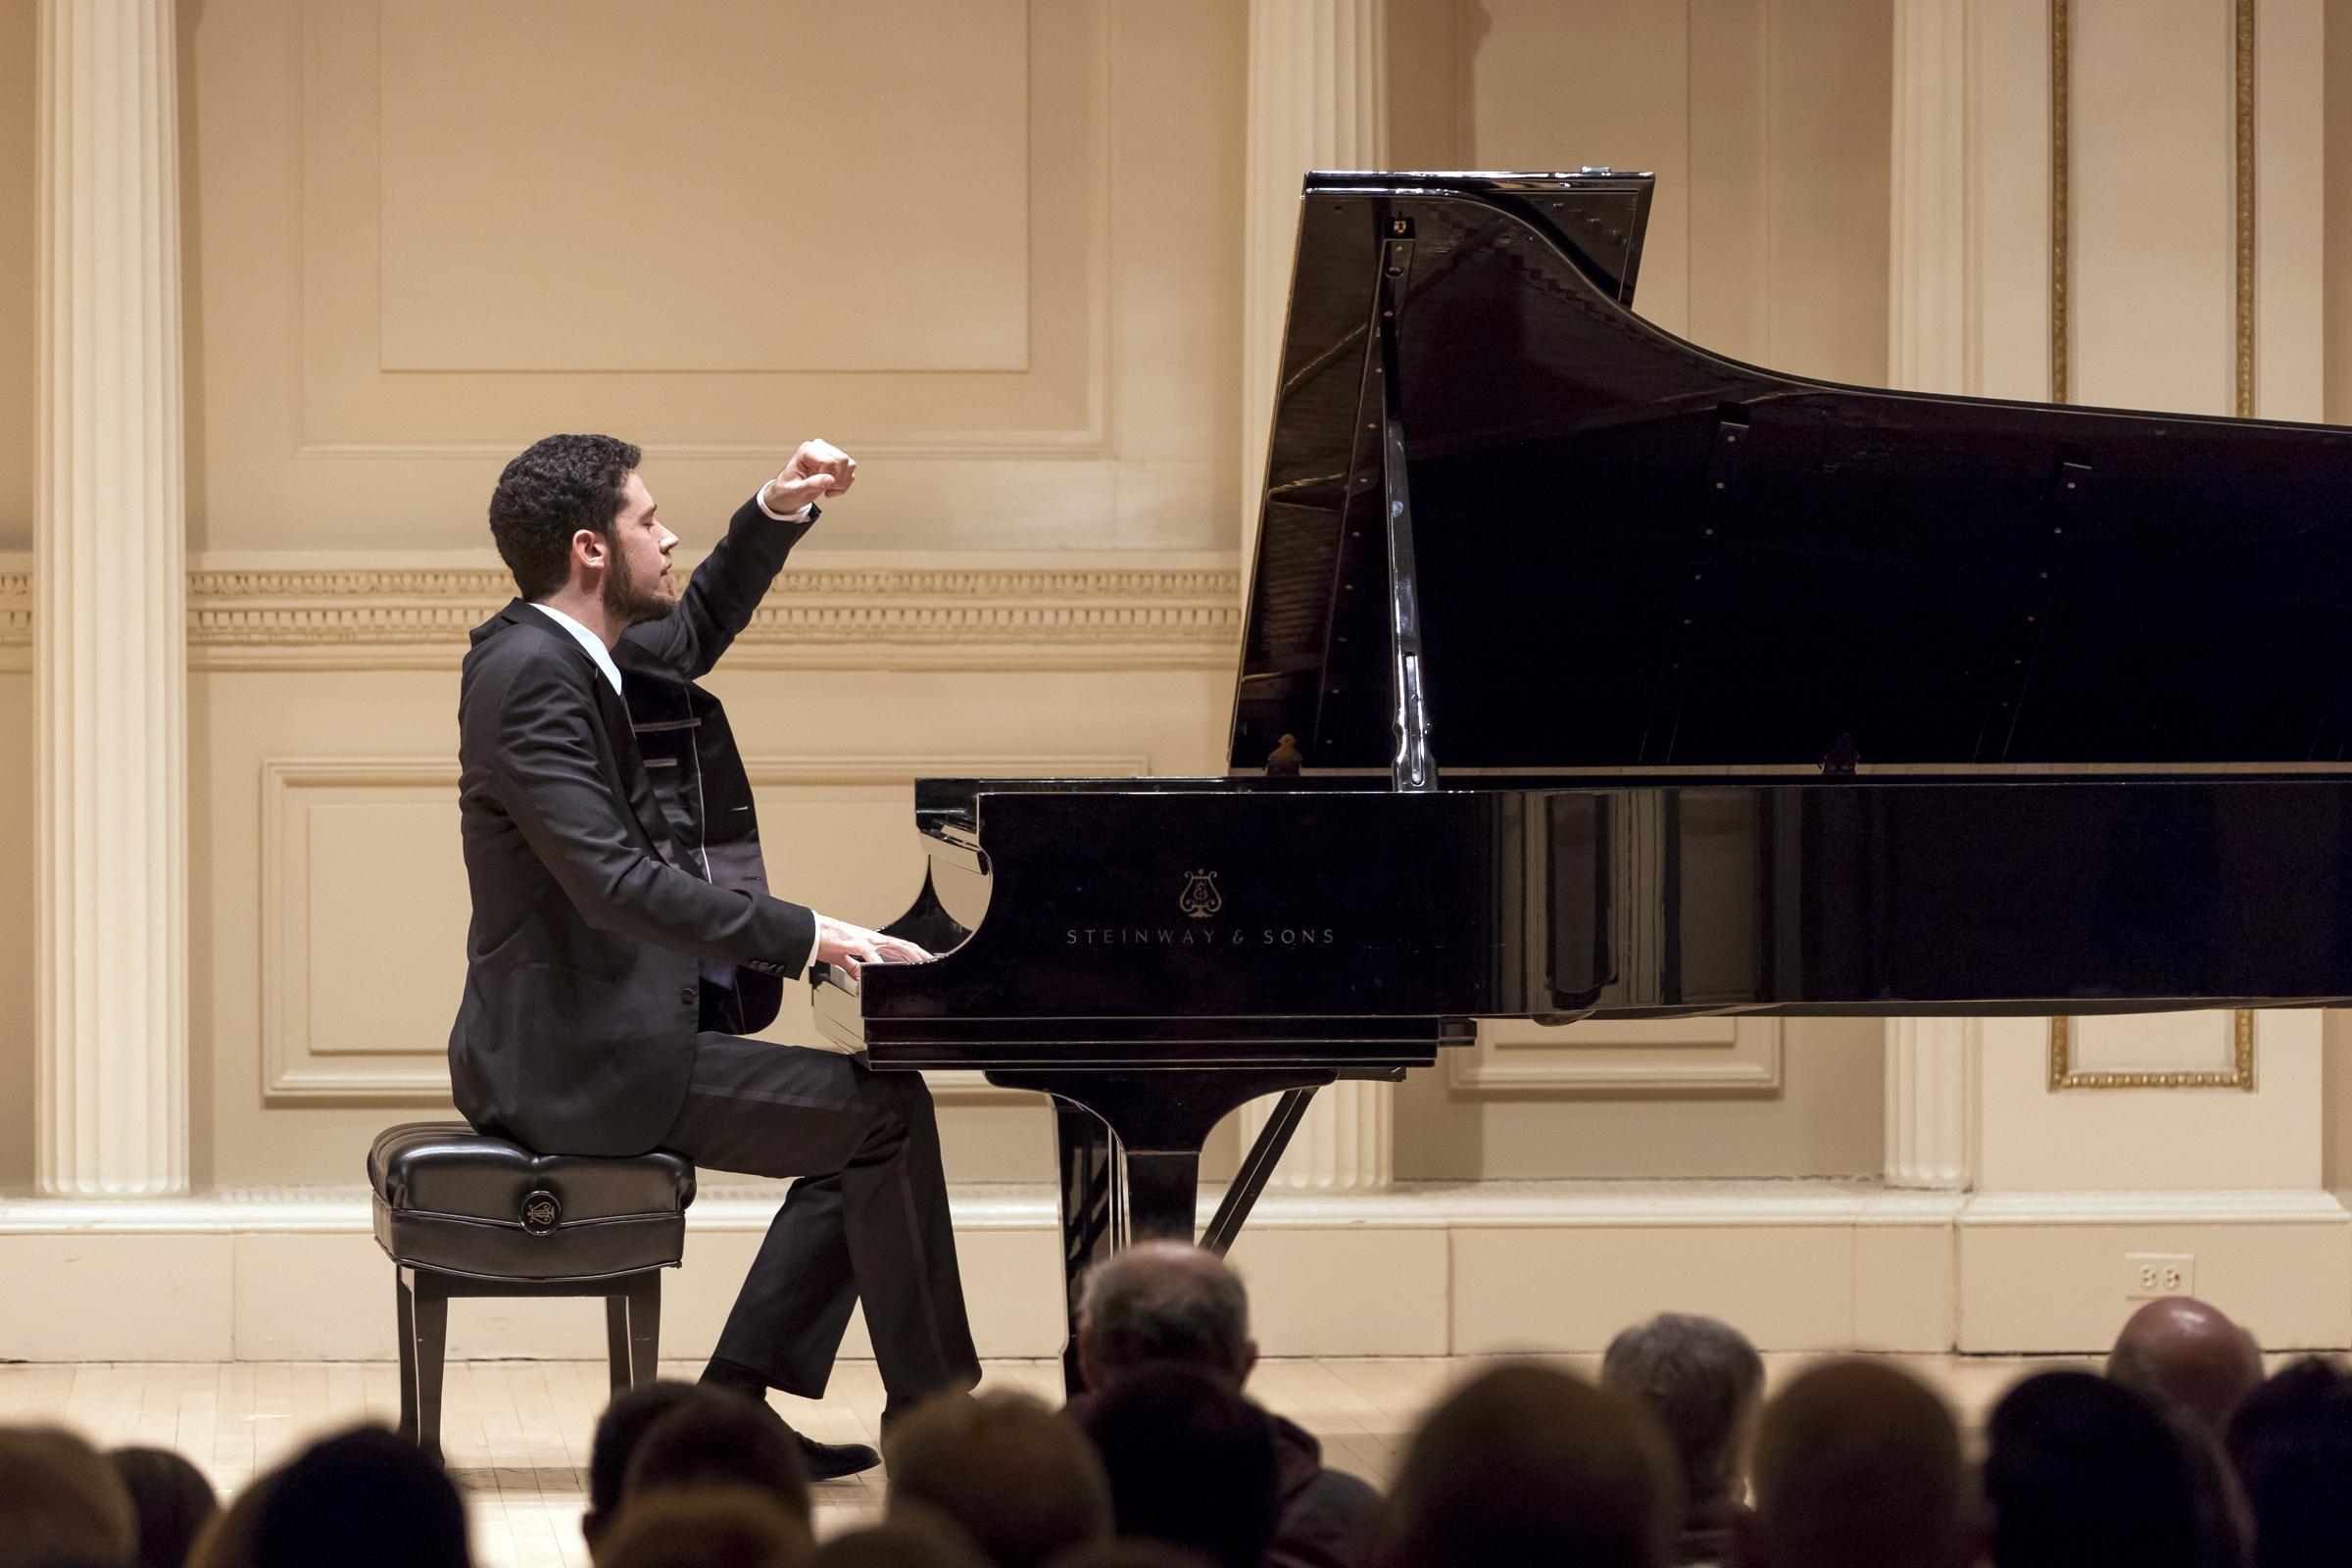 Recital in Weill Hall at Carnegie Hall